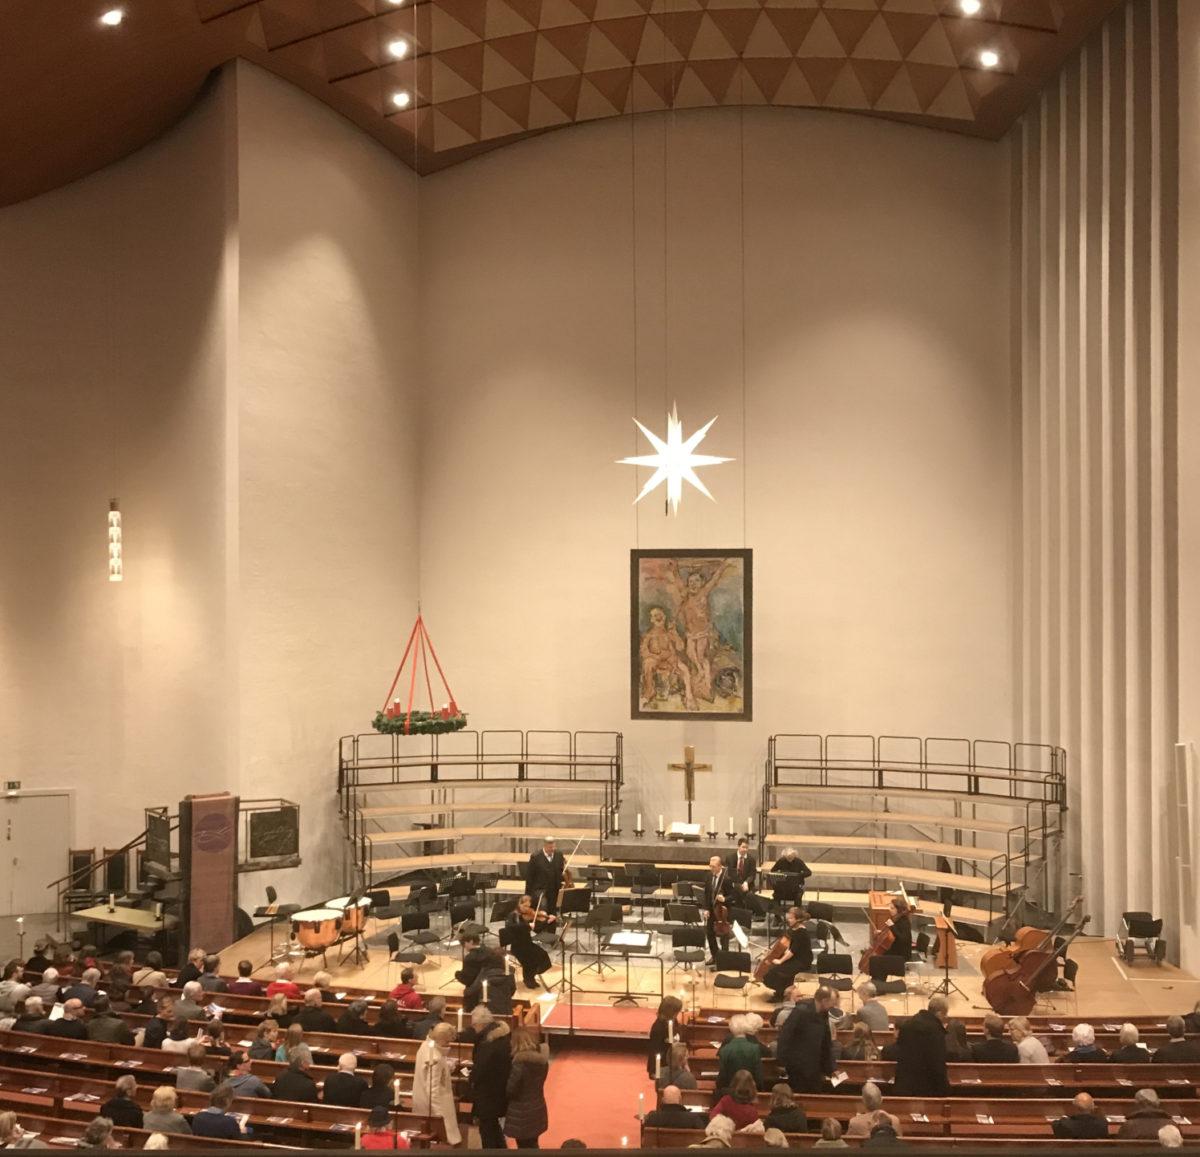 Johann Sebastian Bach, Das Weihnachtsoratorium,  Hauptkirche St. Nikolai am Klosterstern, 19. Dezember 2019